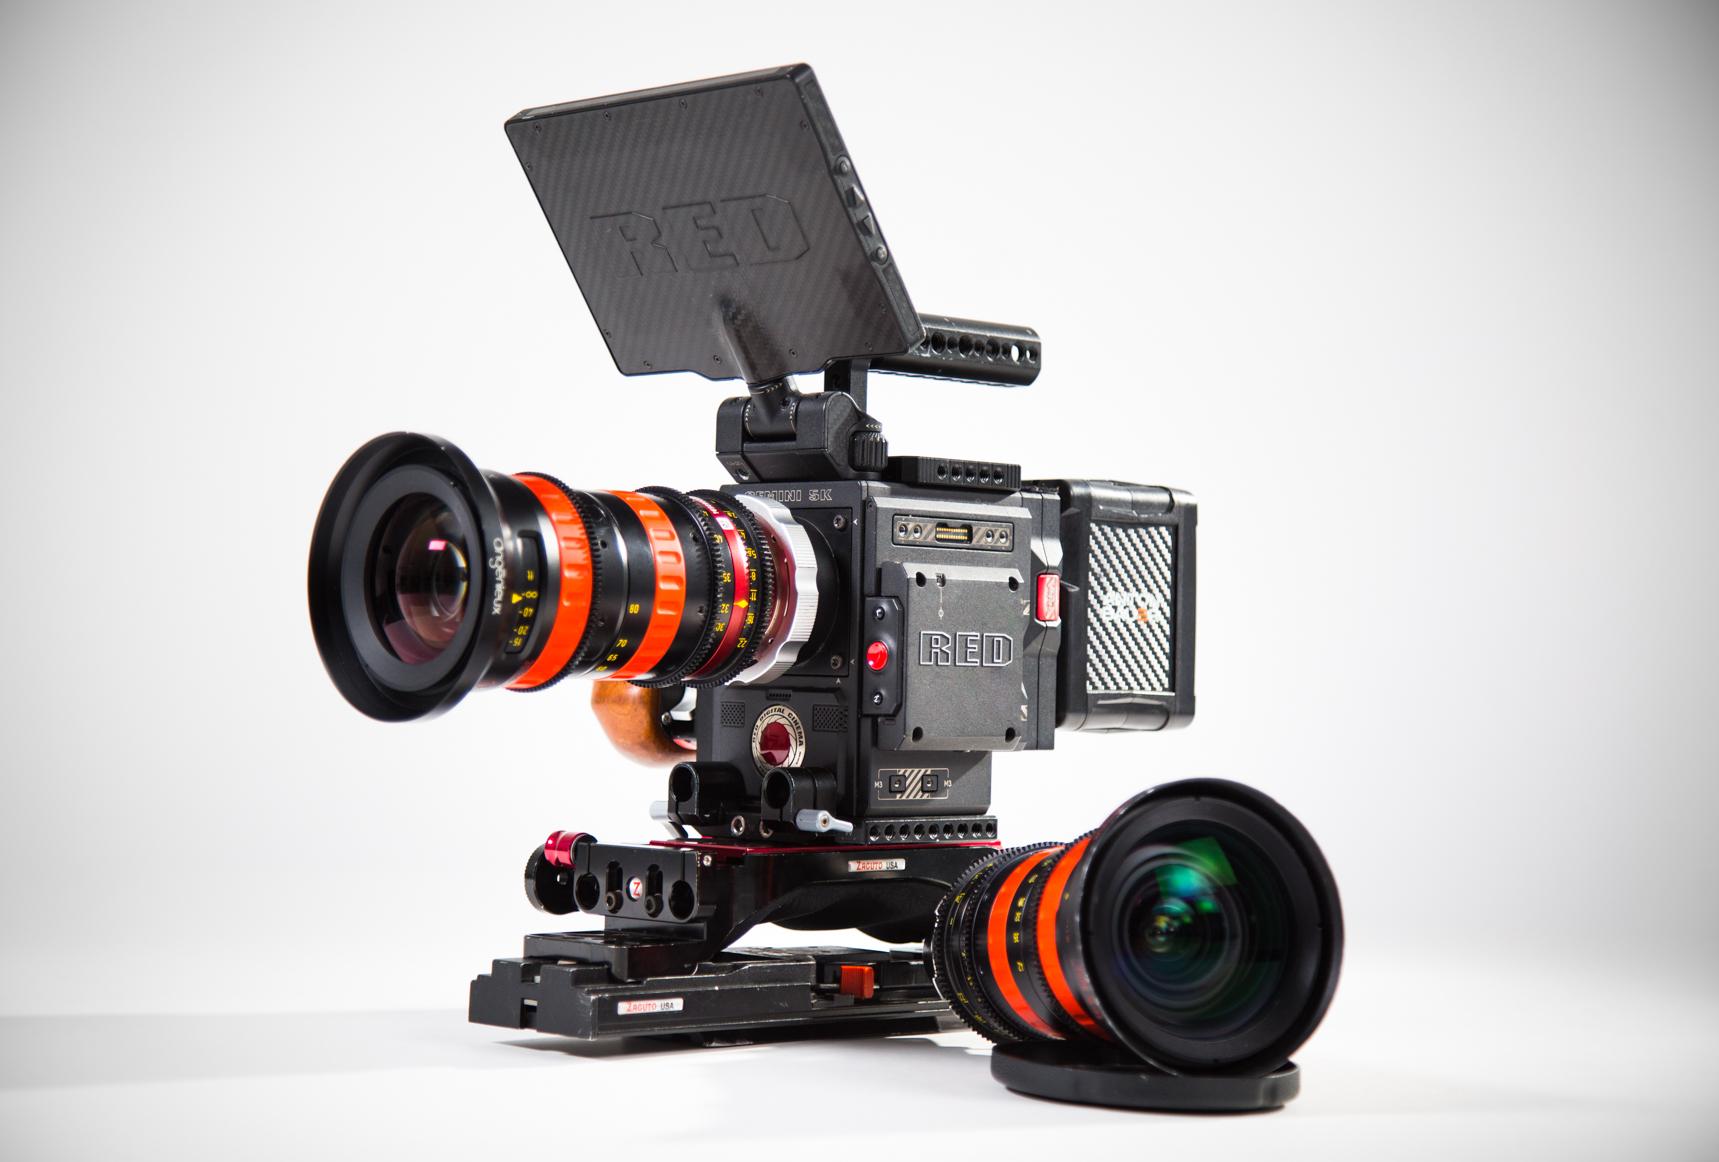 RED Gemini DSMC2 - Angenieux Optimo DP Zoom Package